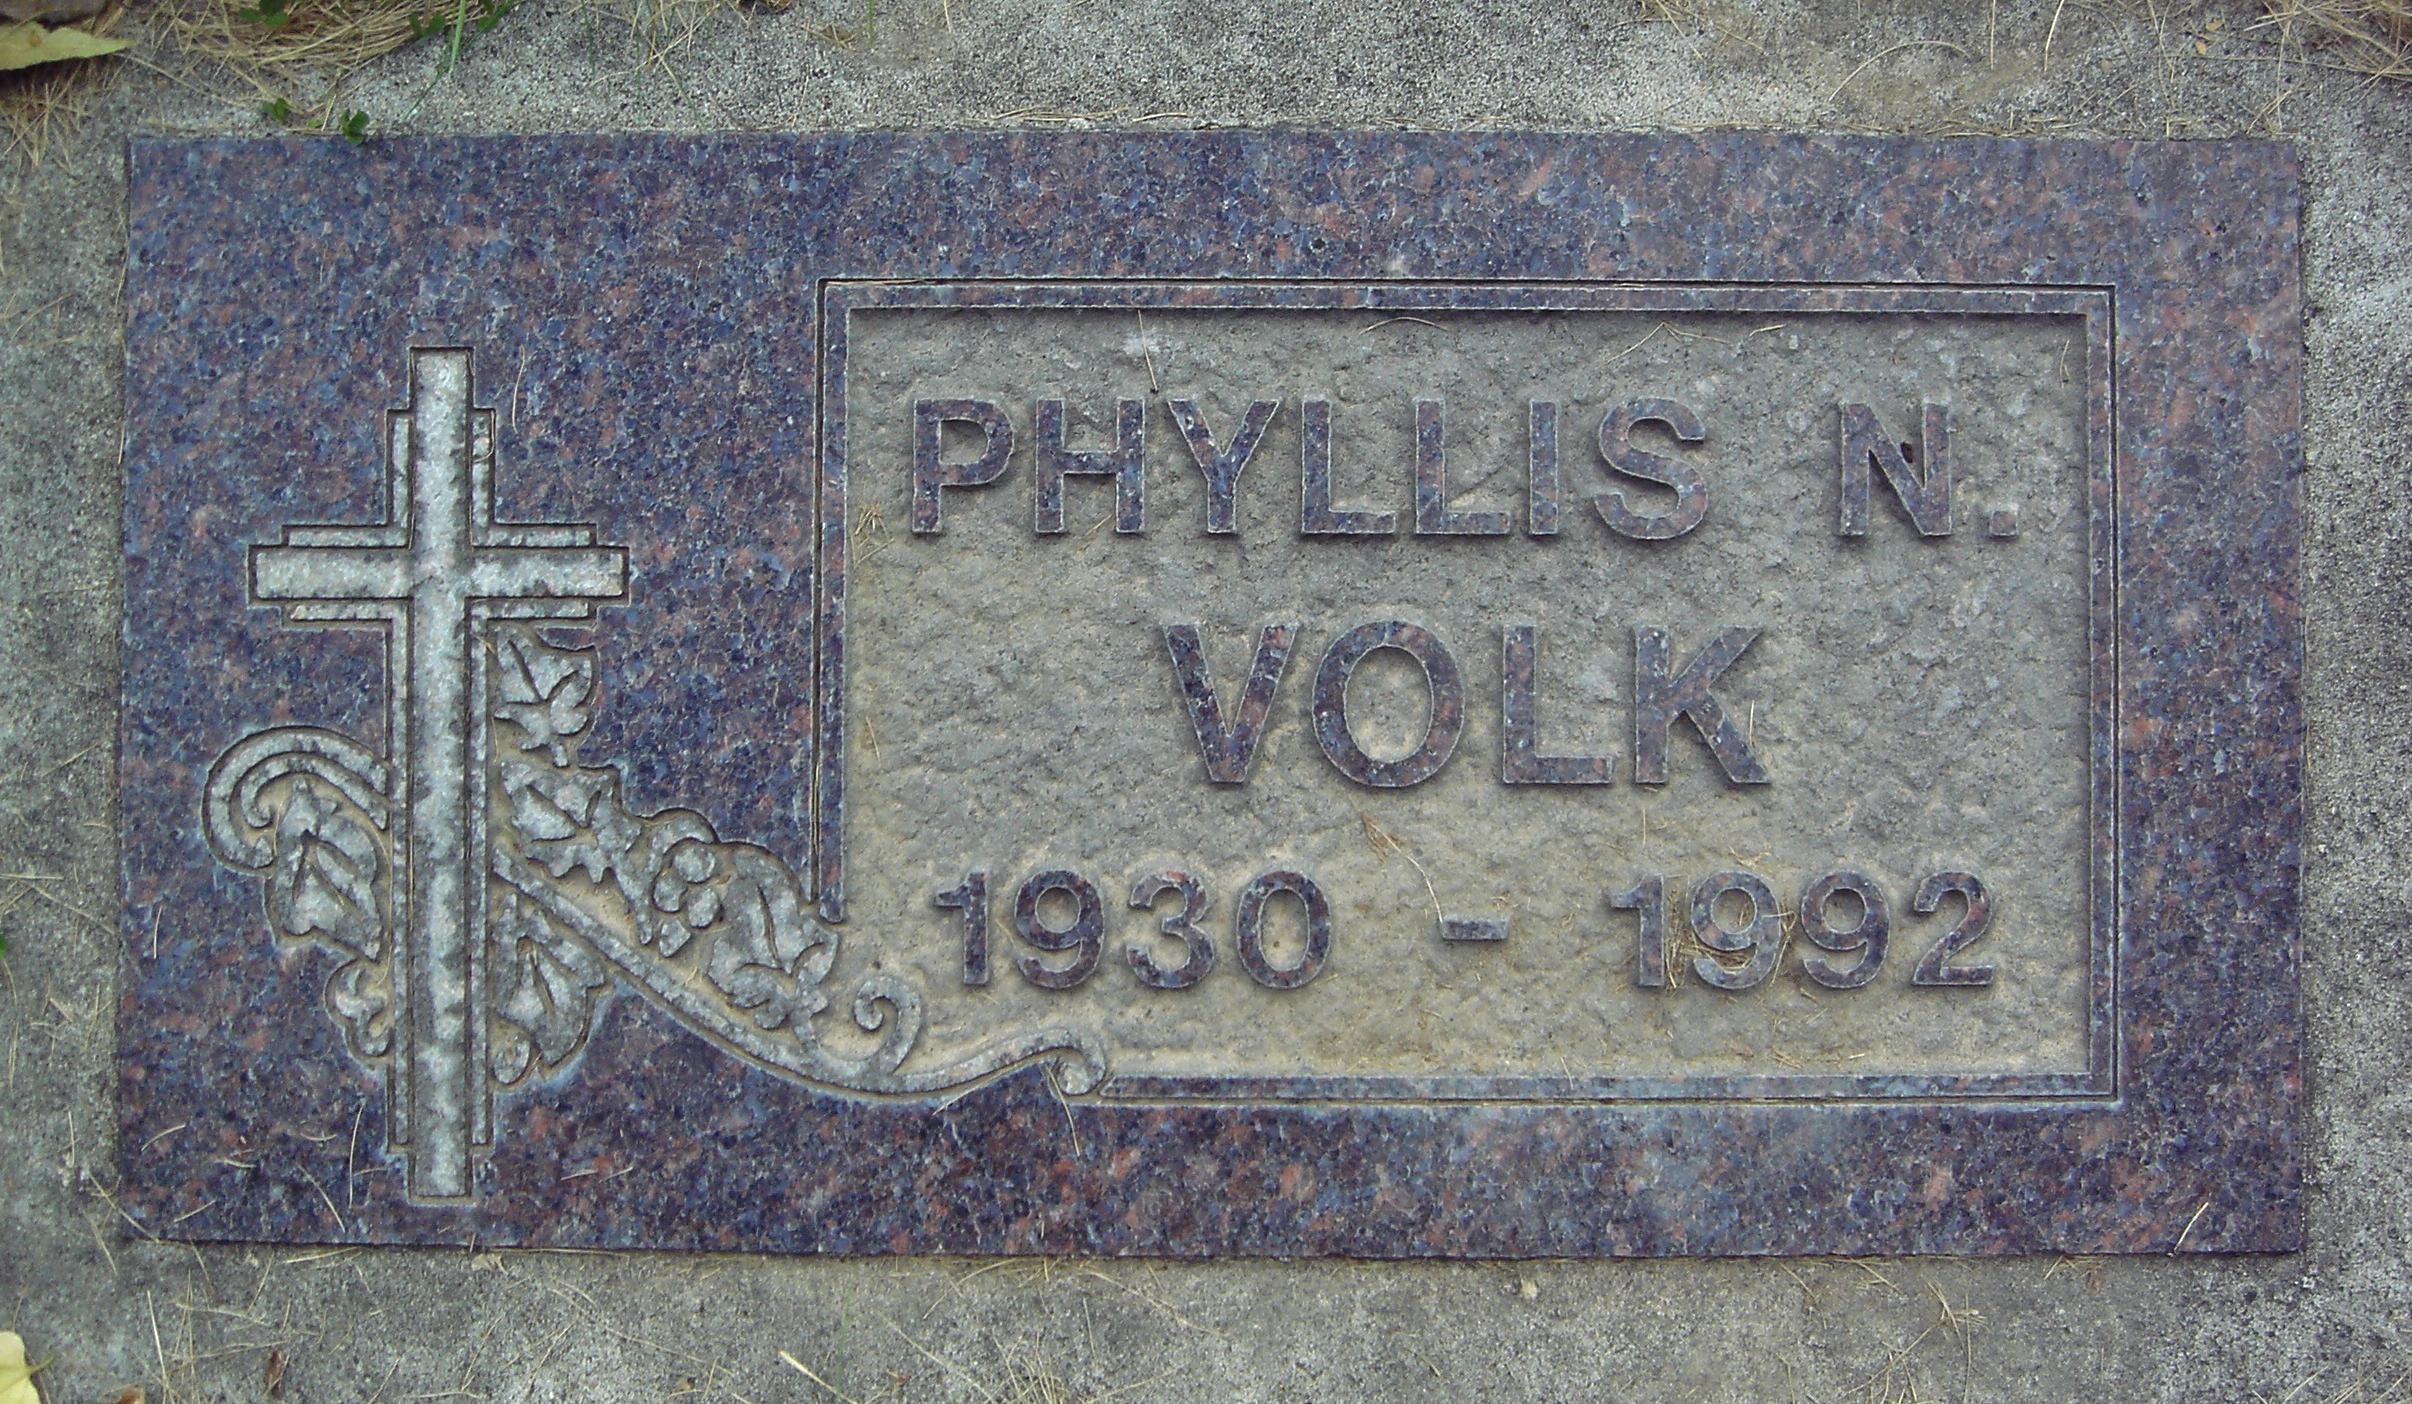 Phyllis N Waddell